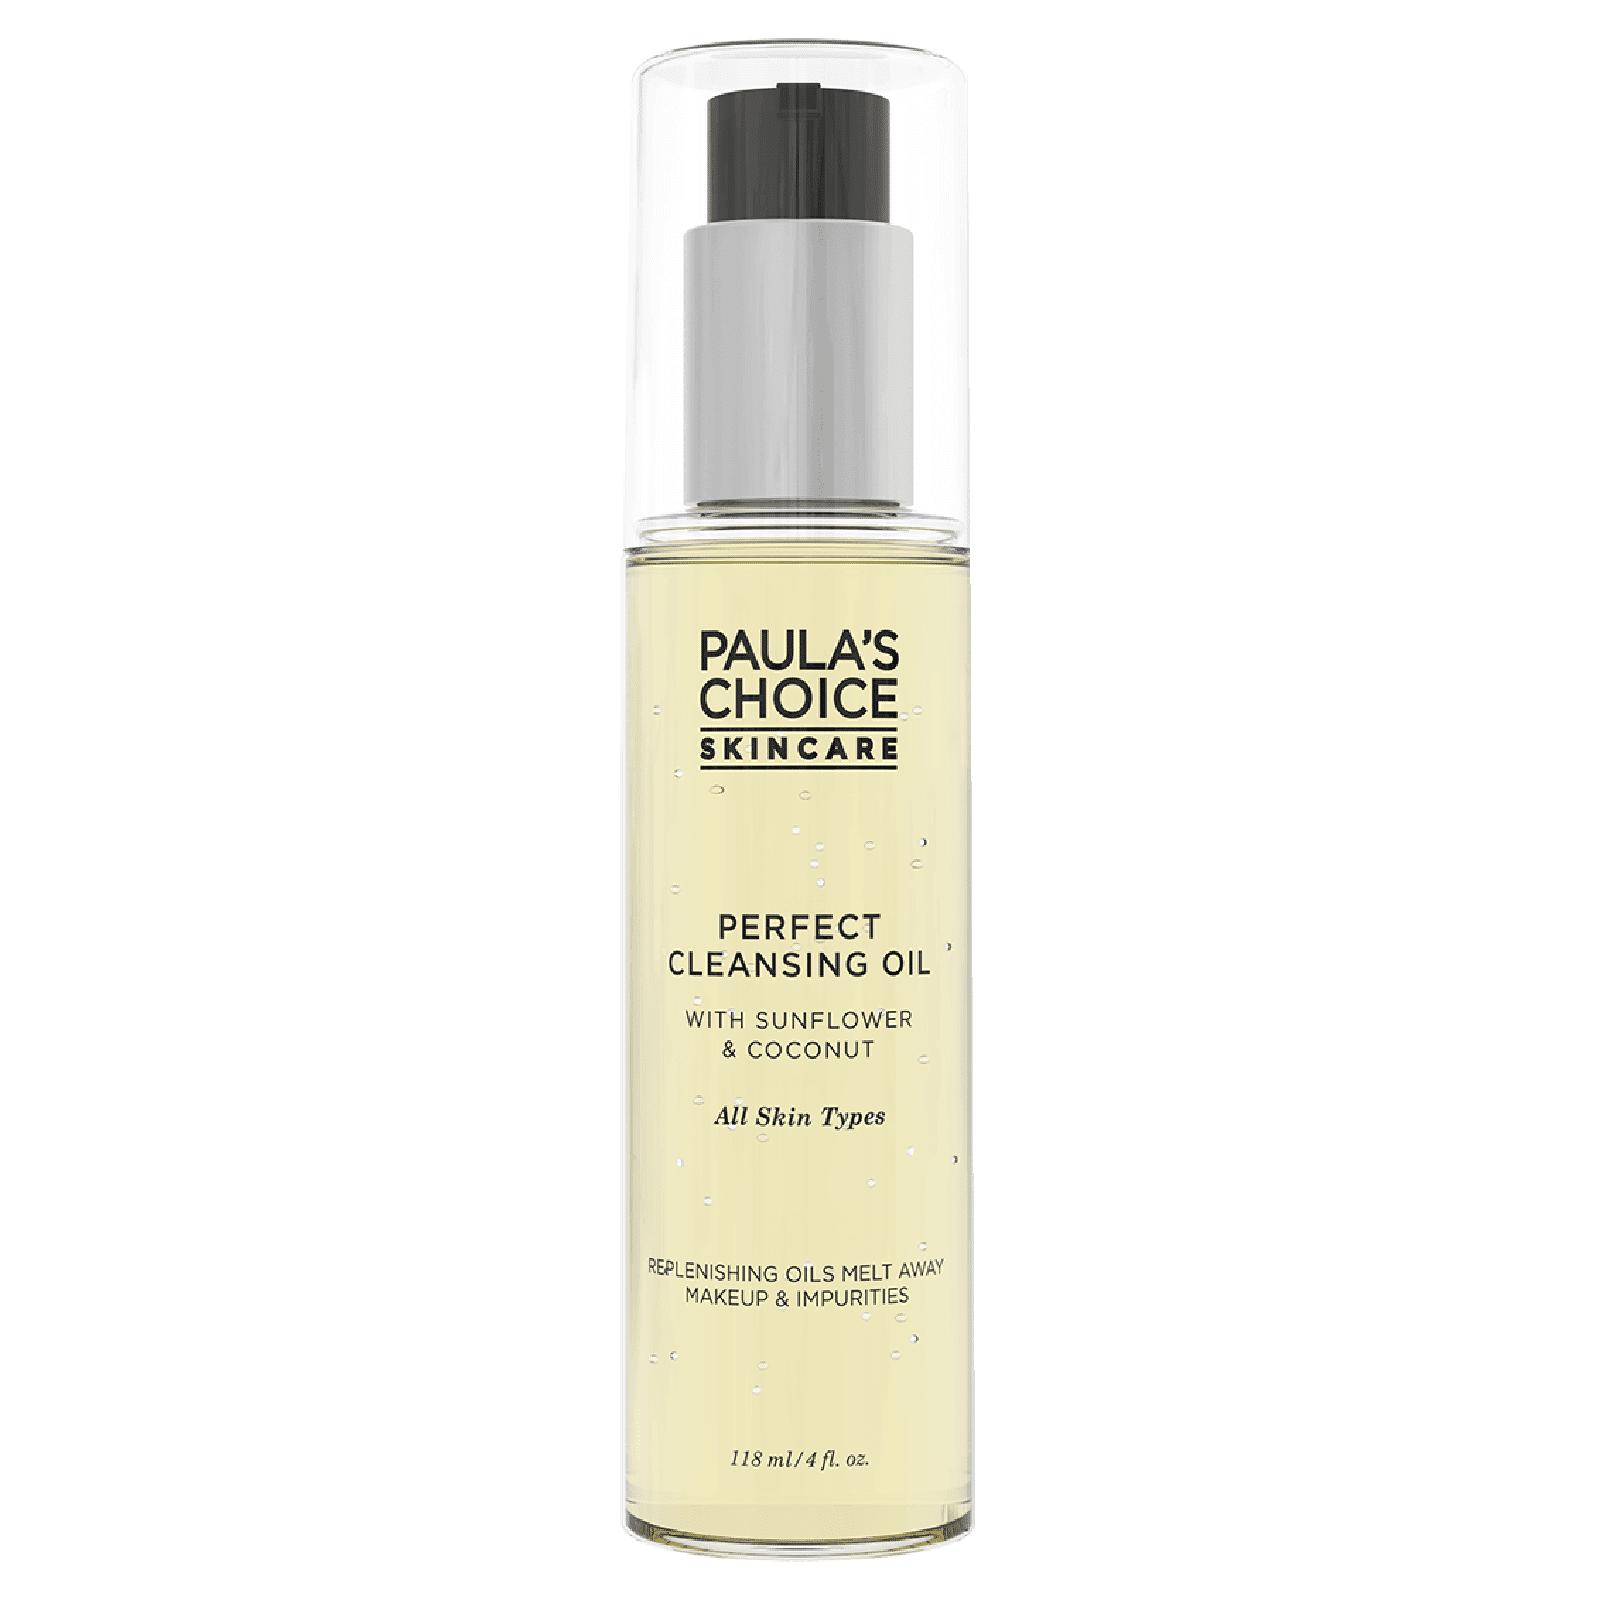 Paula's Choice Perfect Cleansing Oil 118ml